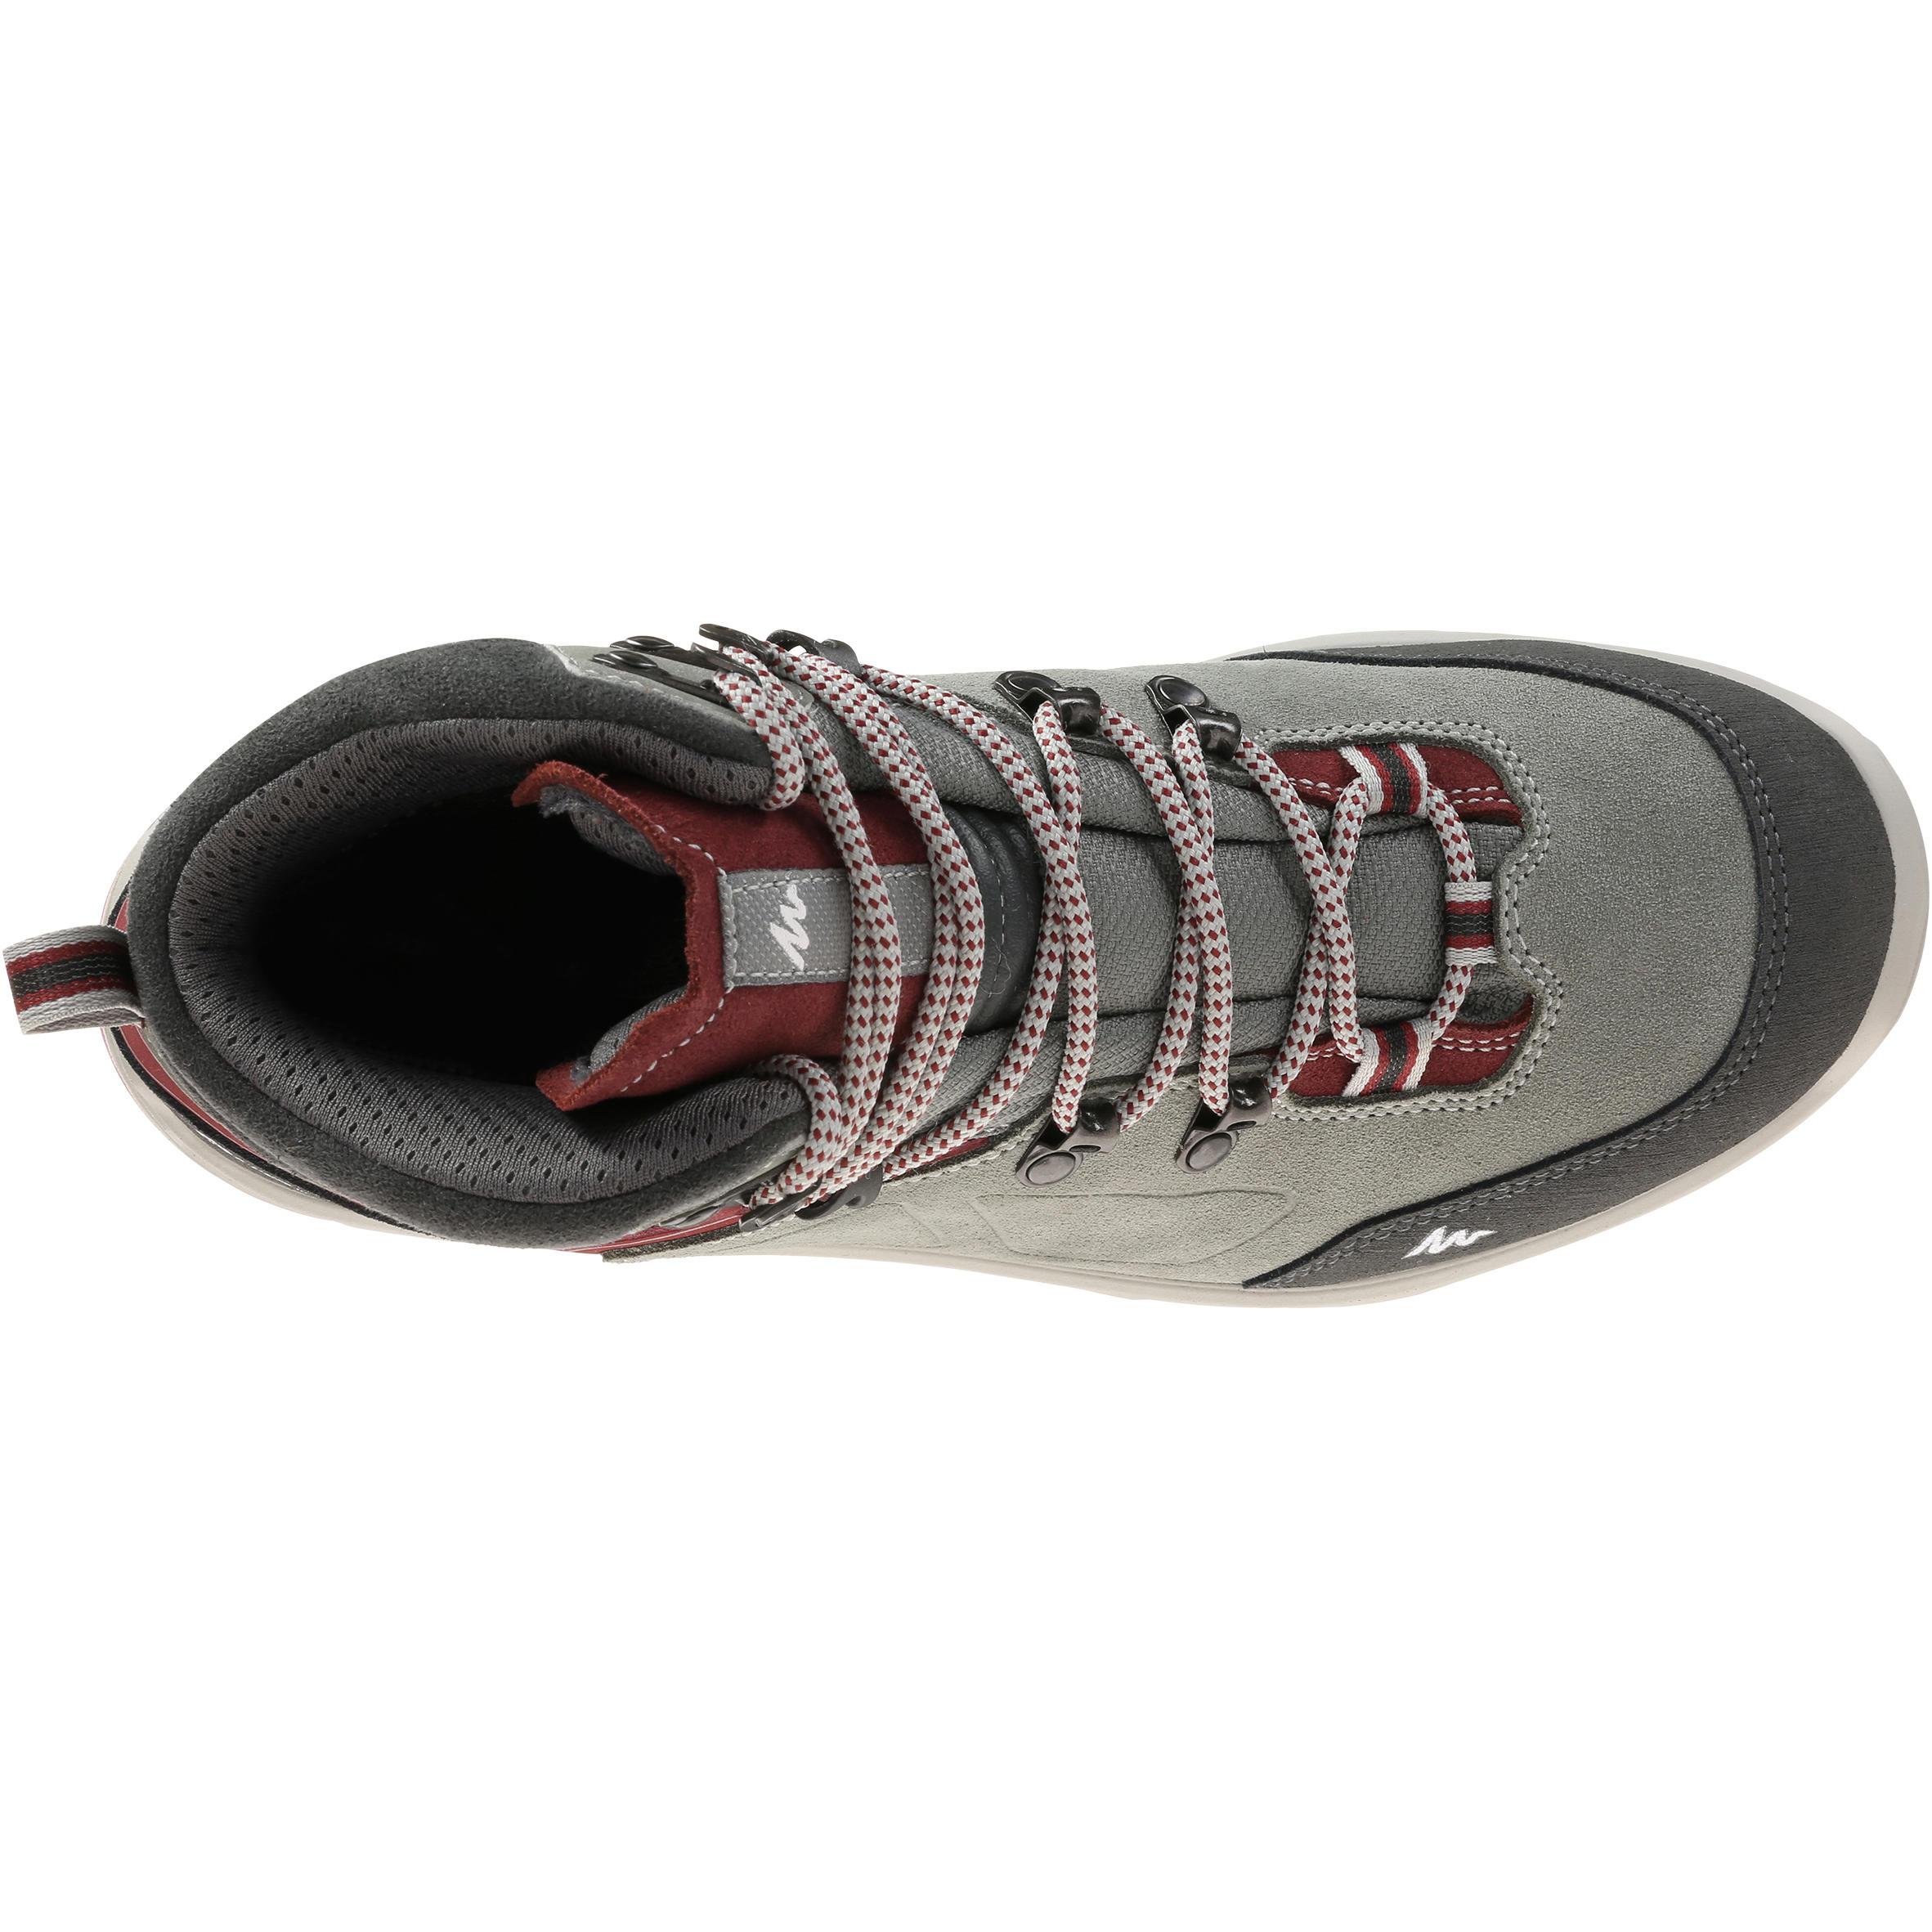 Trekking 100 Waterproof Woman's Shoe - Grey